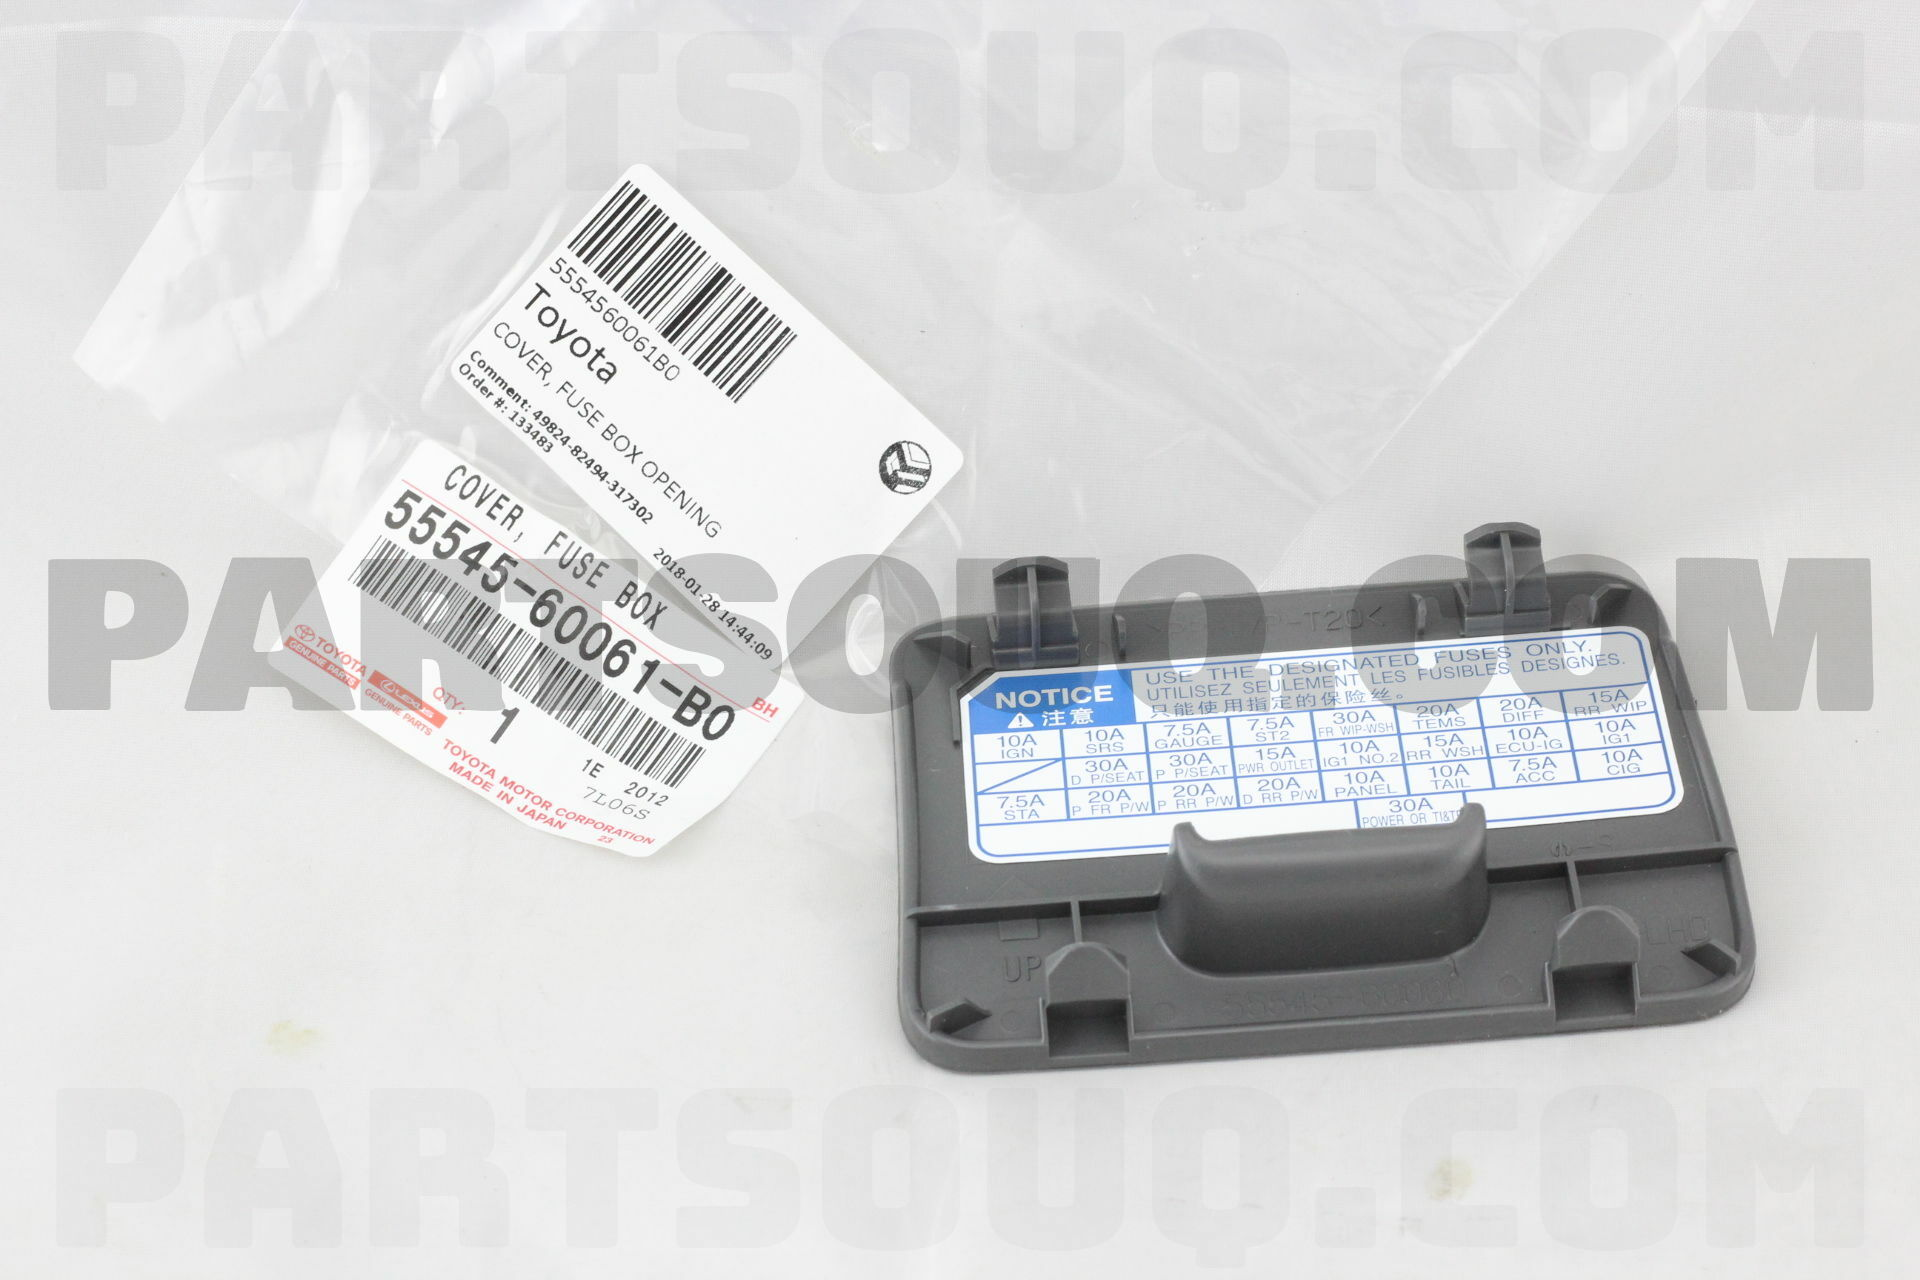 hight resolution of toyota fuse box price wiring diagrams mon toyota innova fuse box price toyota fuse box price